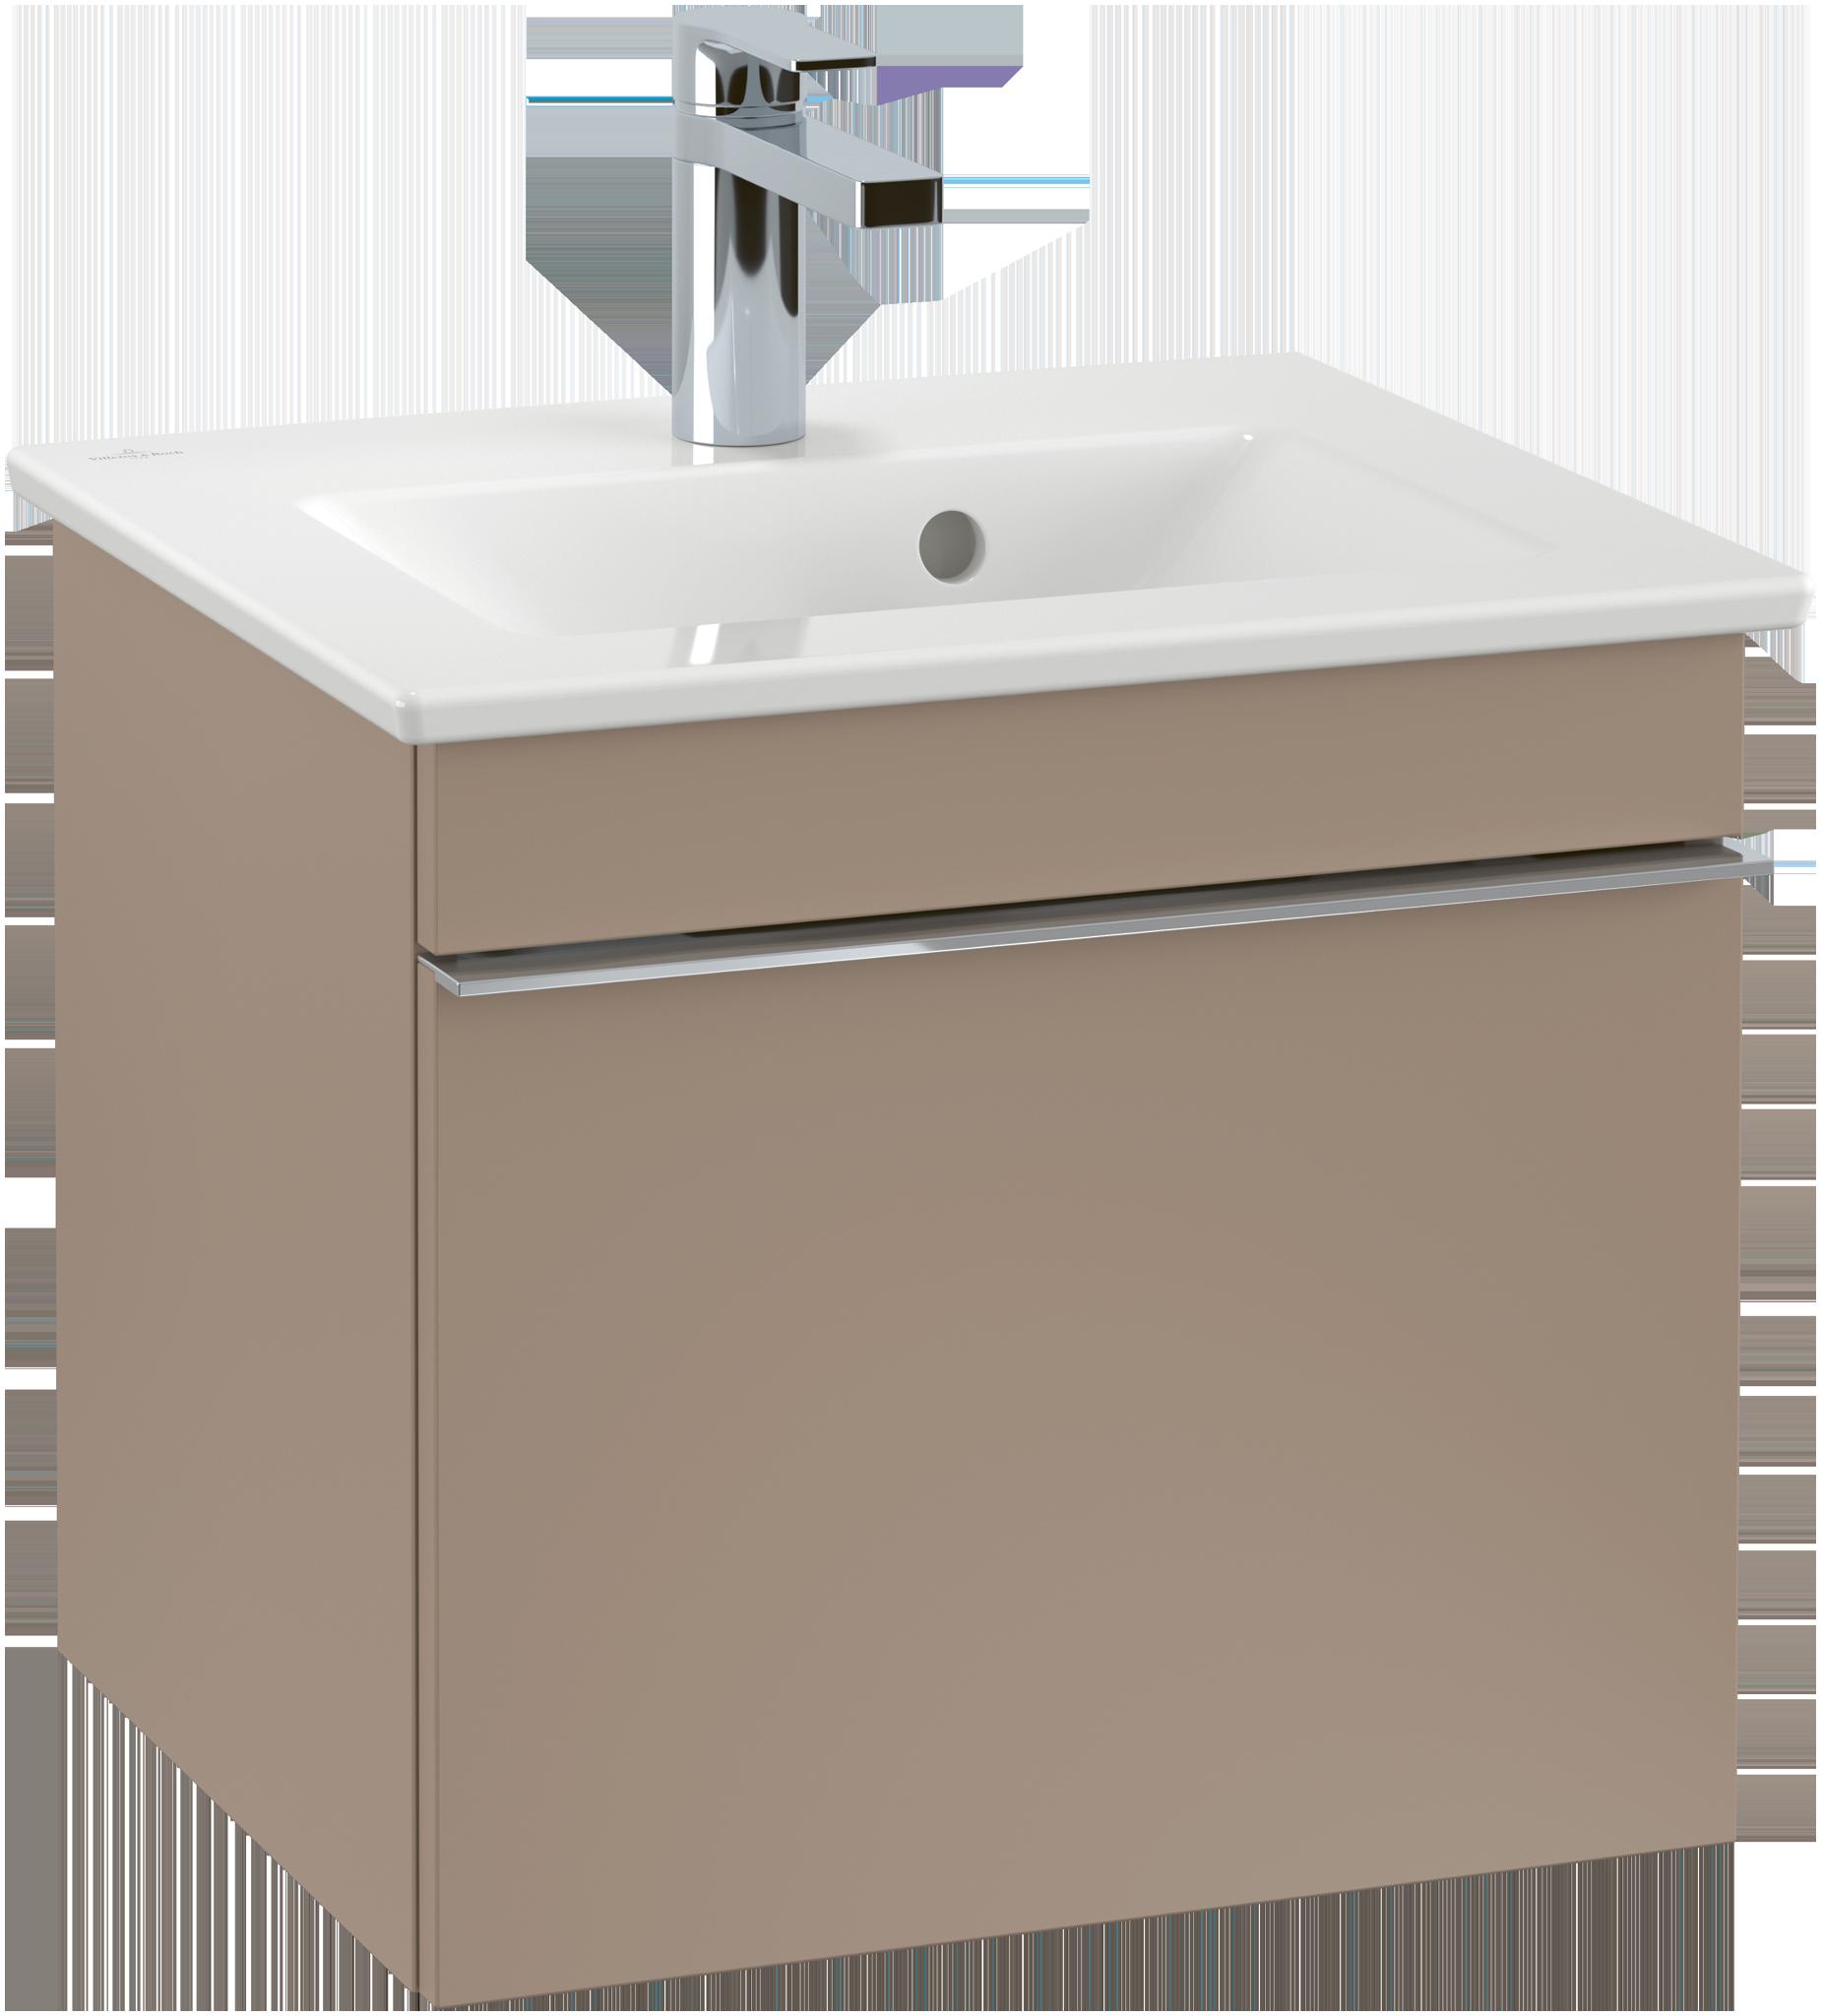 Venticello meuble sous lavabo a93102 villeroy boch for Meuble sous lavabo fly